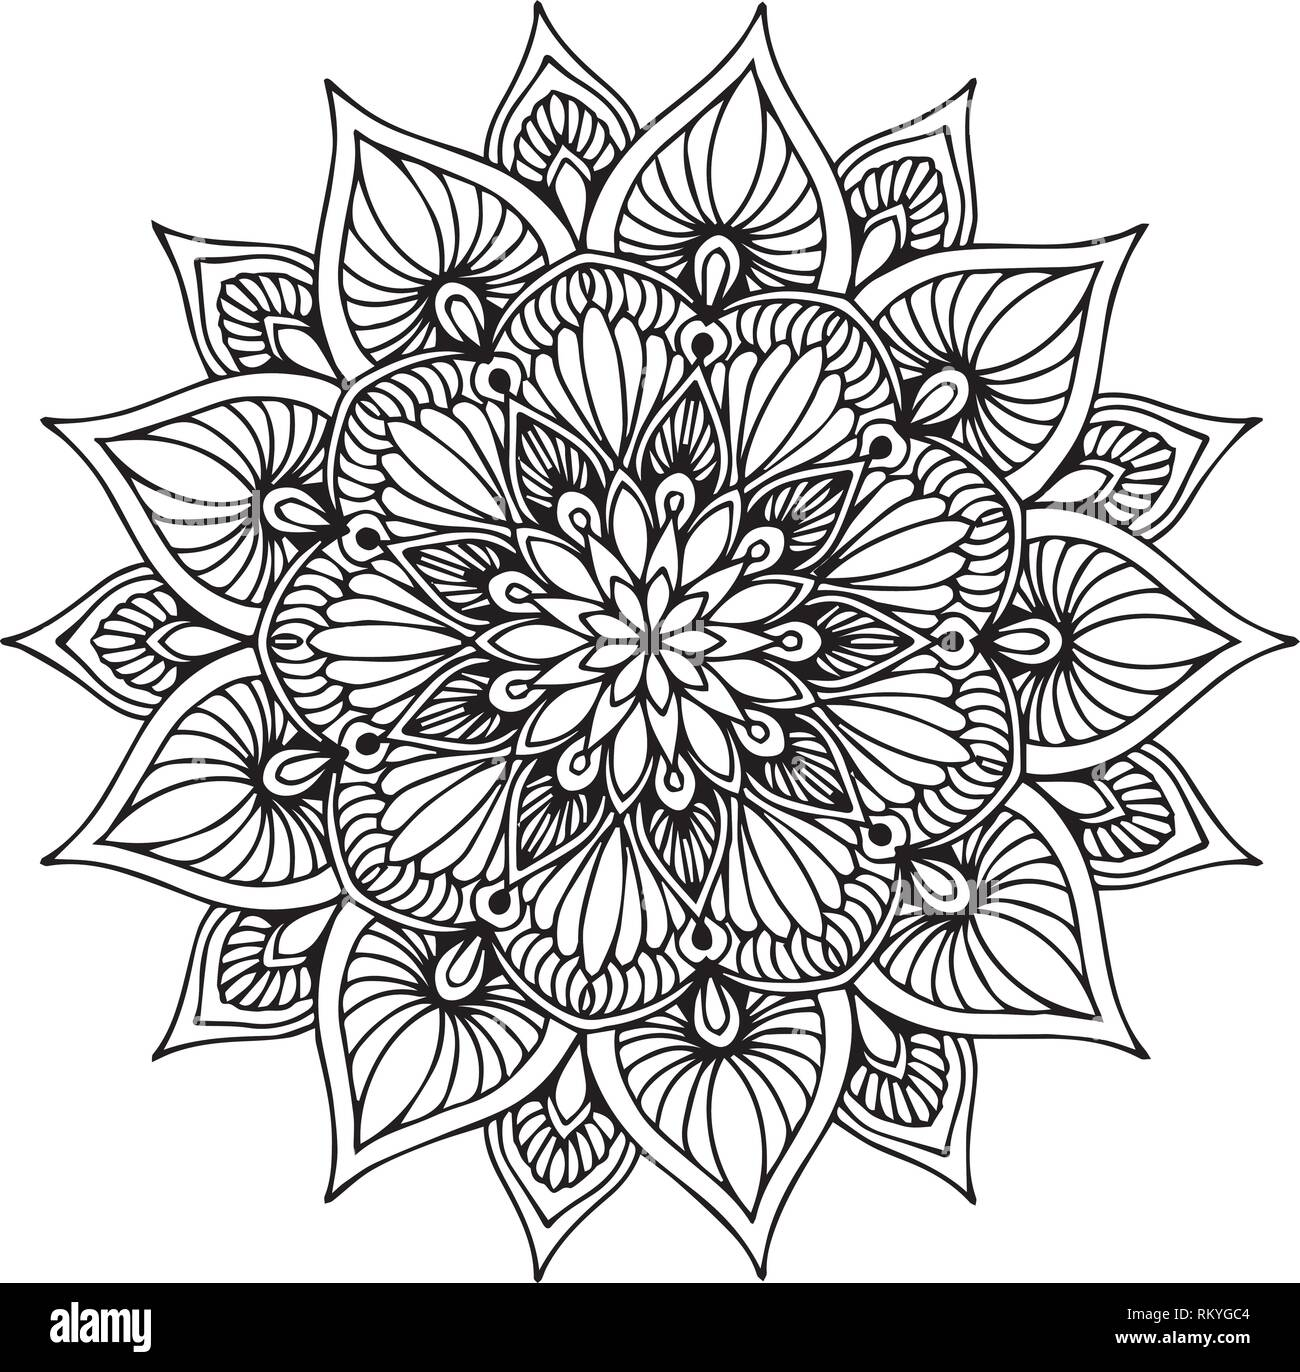 Mandalas coloring book, Oriental therapy, Yoga logos Vector ...